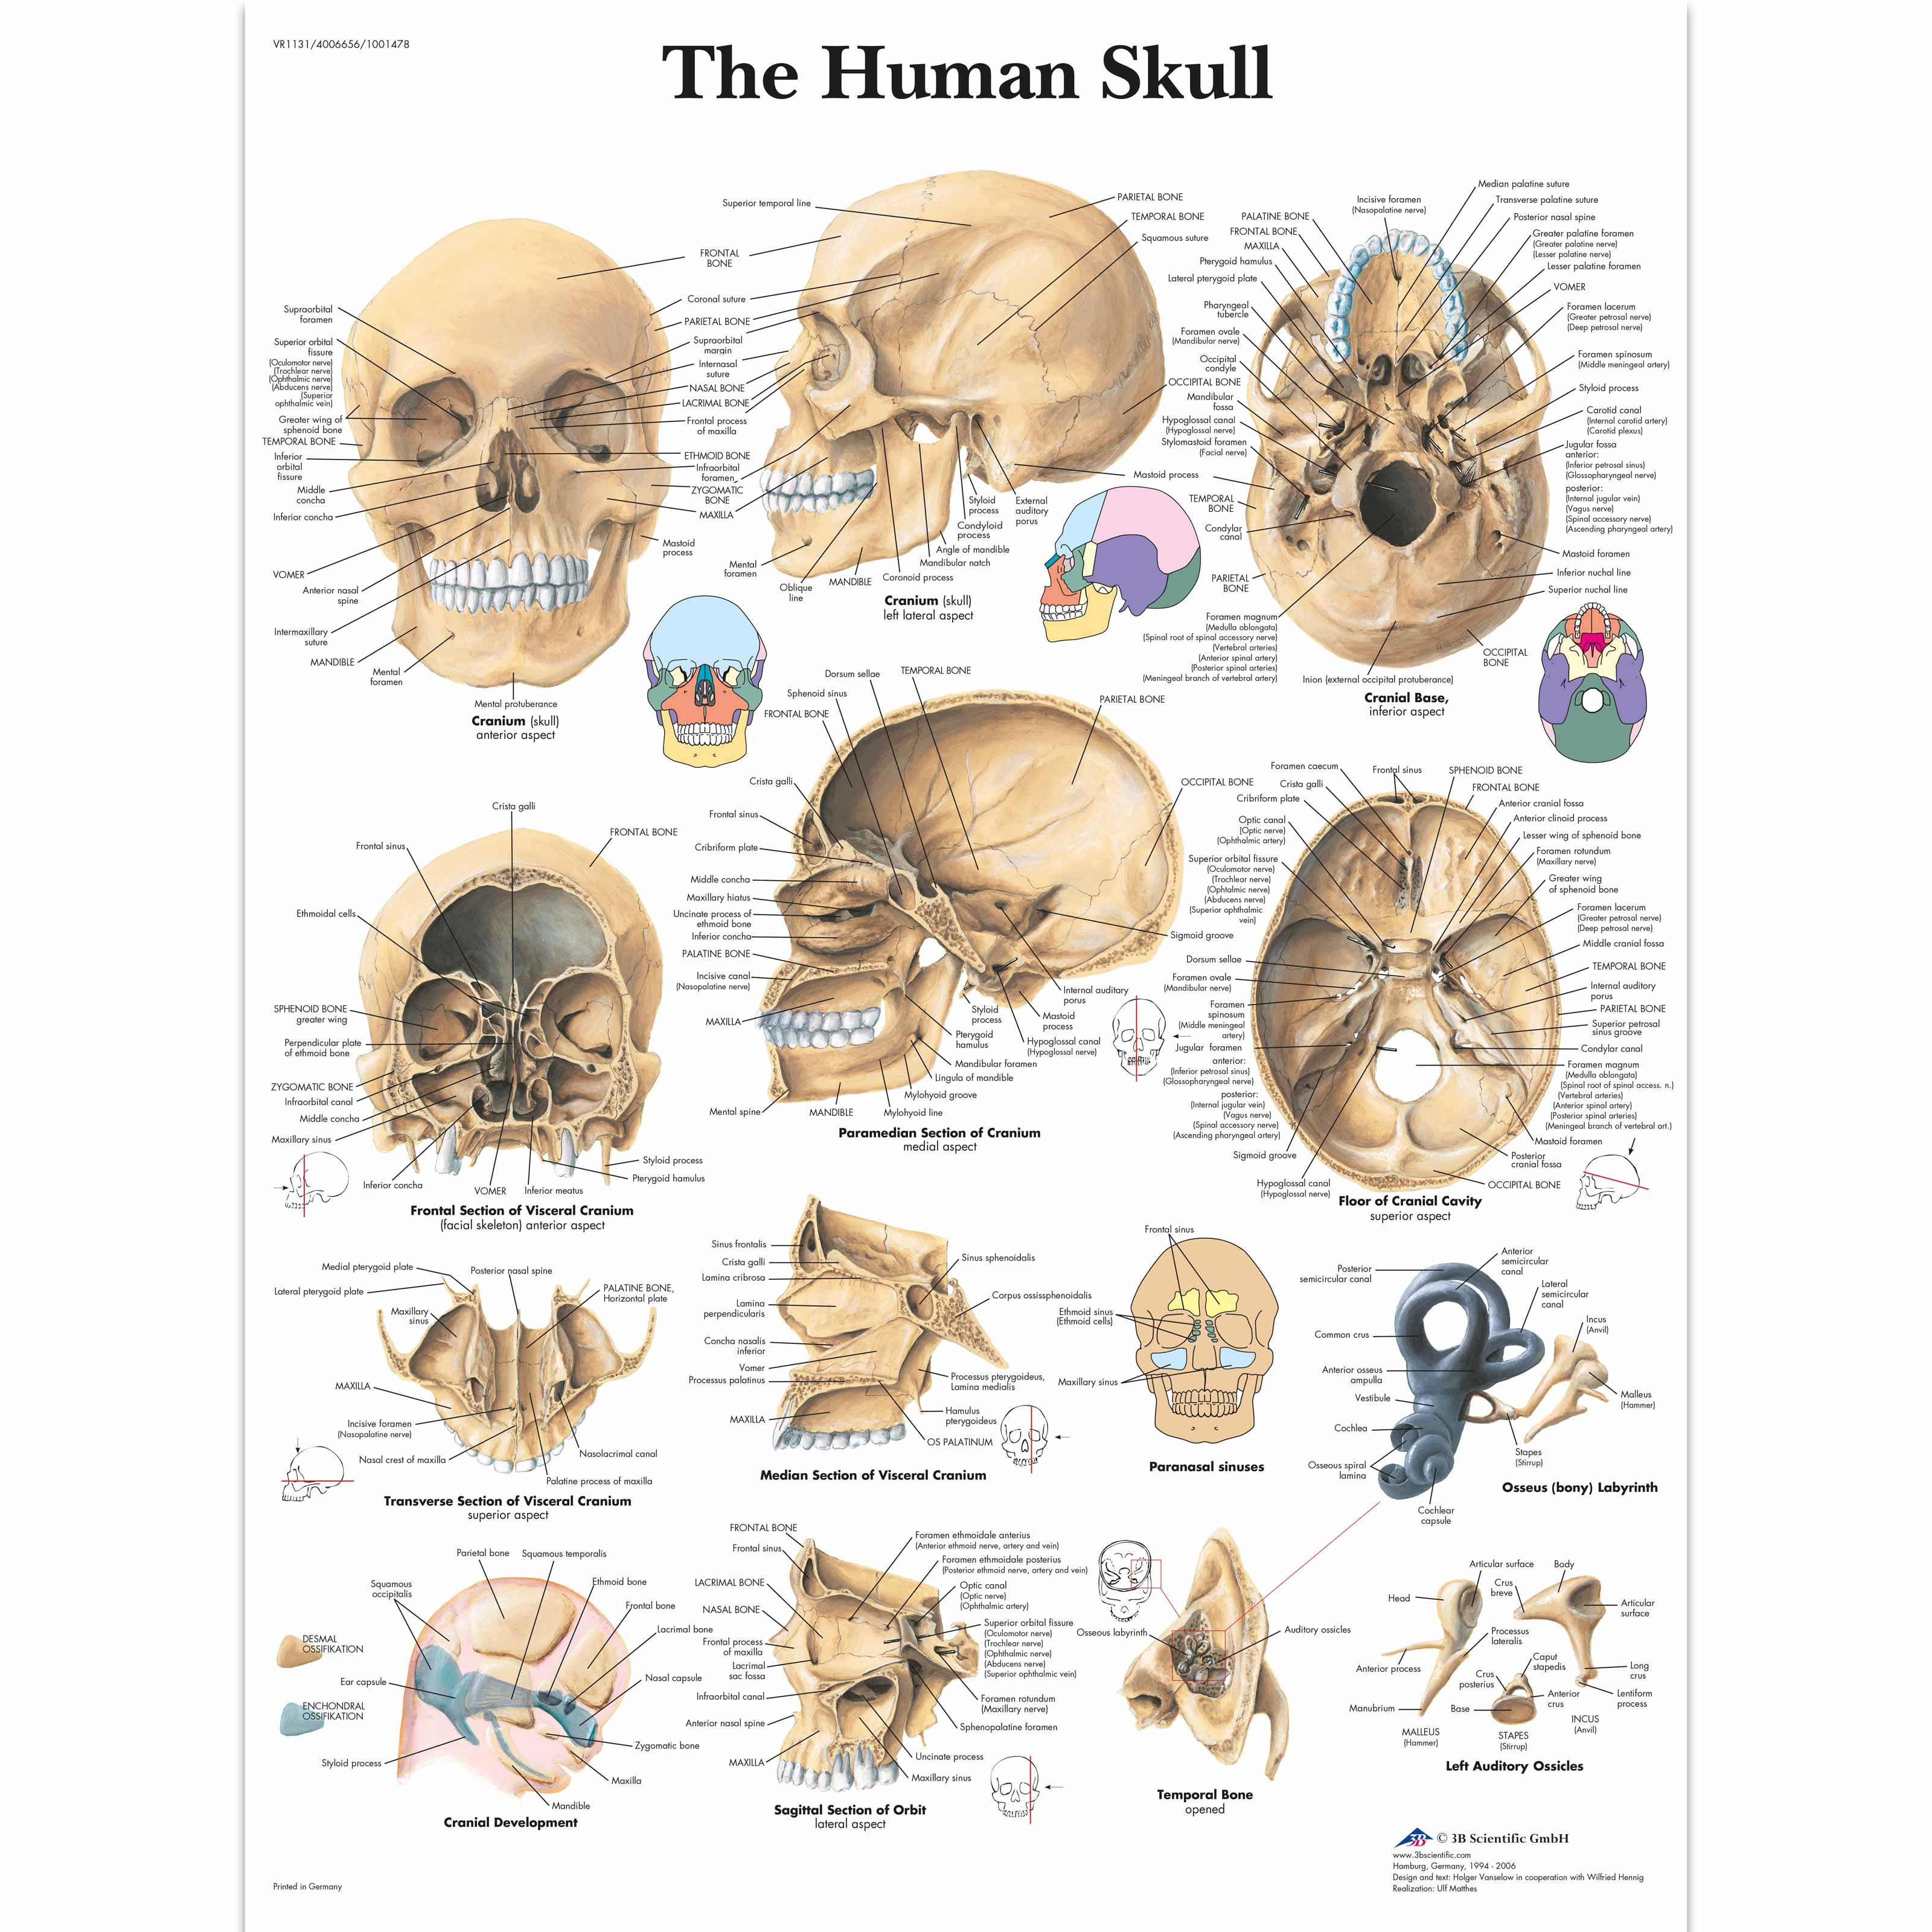 Human Skull Chart - 4006656 - VR1131UU - Skeletal System ...